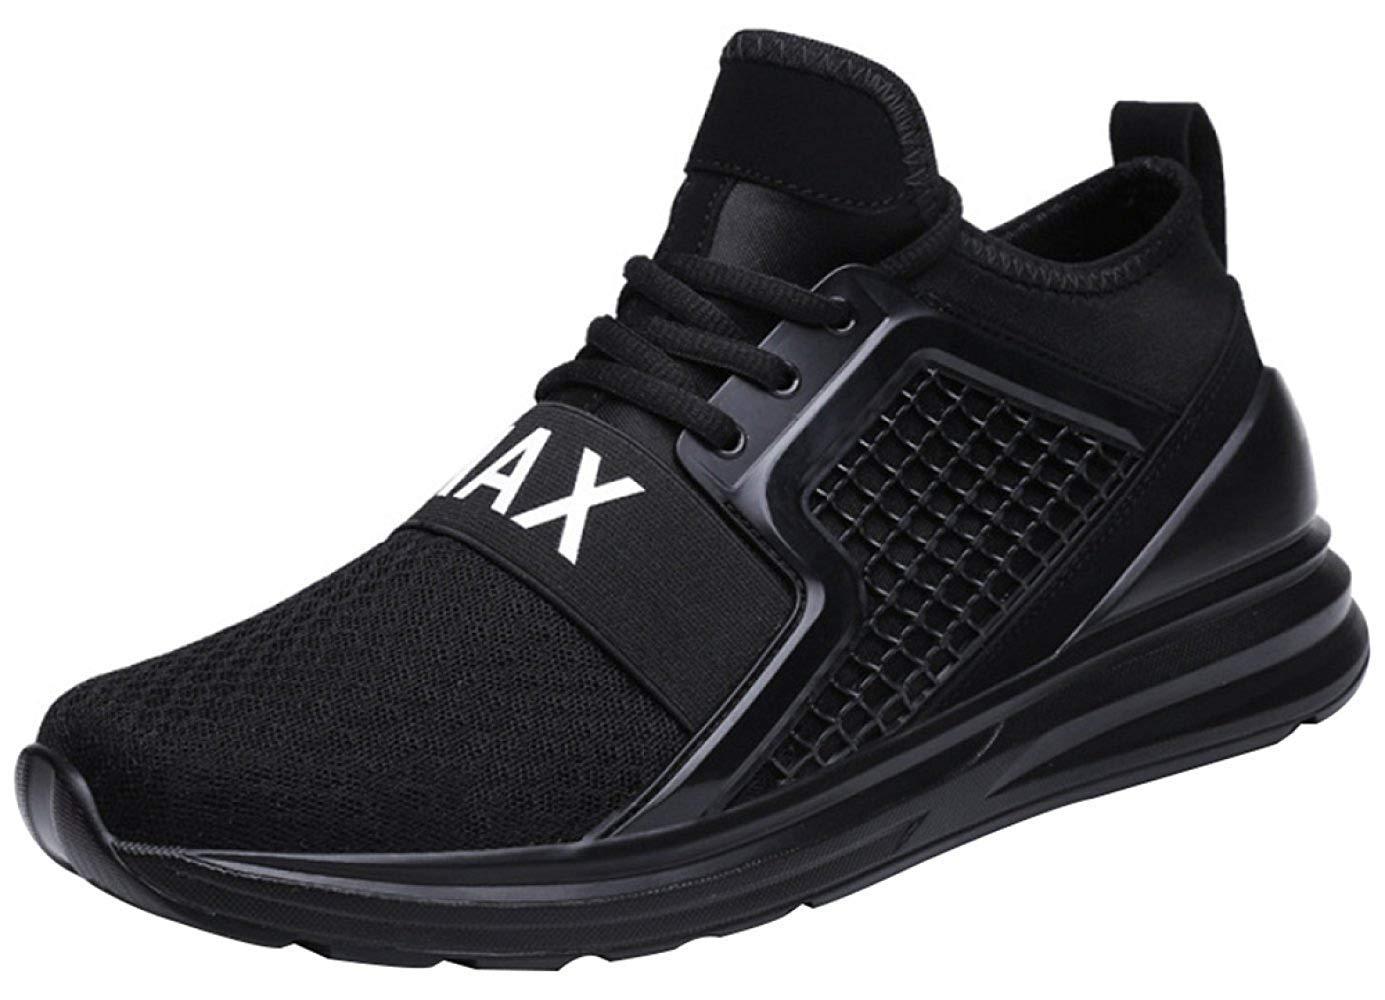 Oudan Laufende Schuhe Der Männer Beiläufige Turnschuhe Breathable Wandernde Mode (Farbe : Schwarz, Größe : 47EU)